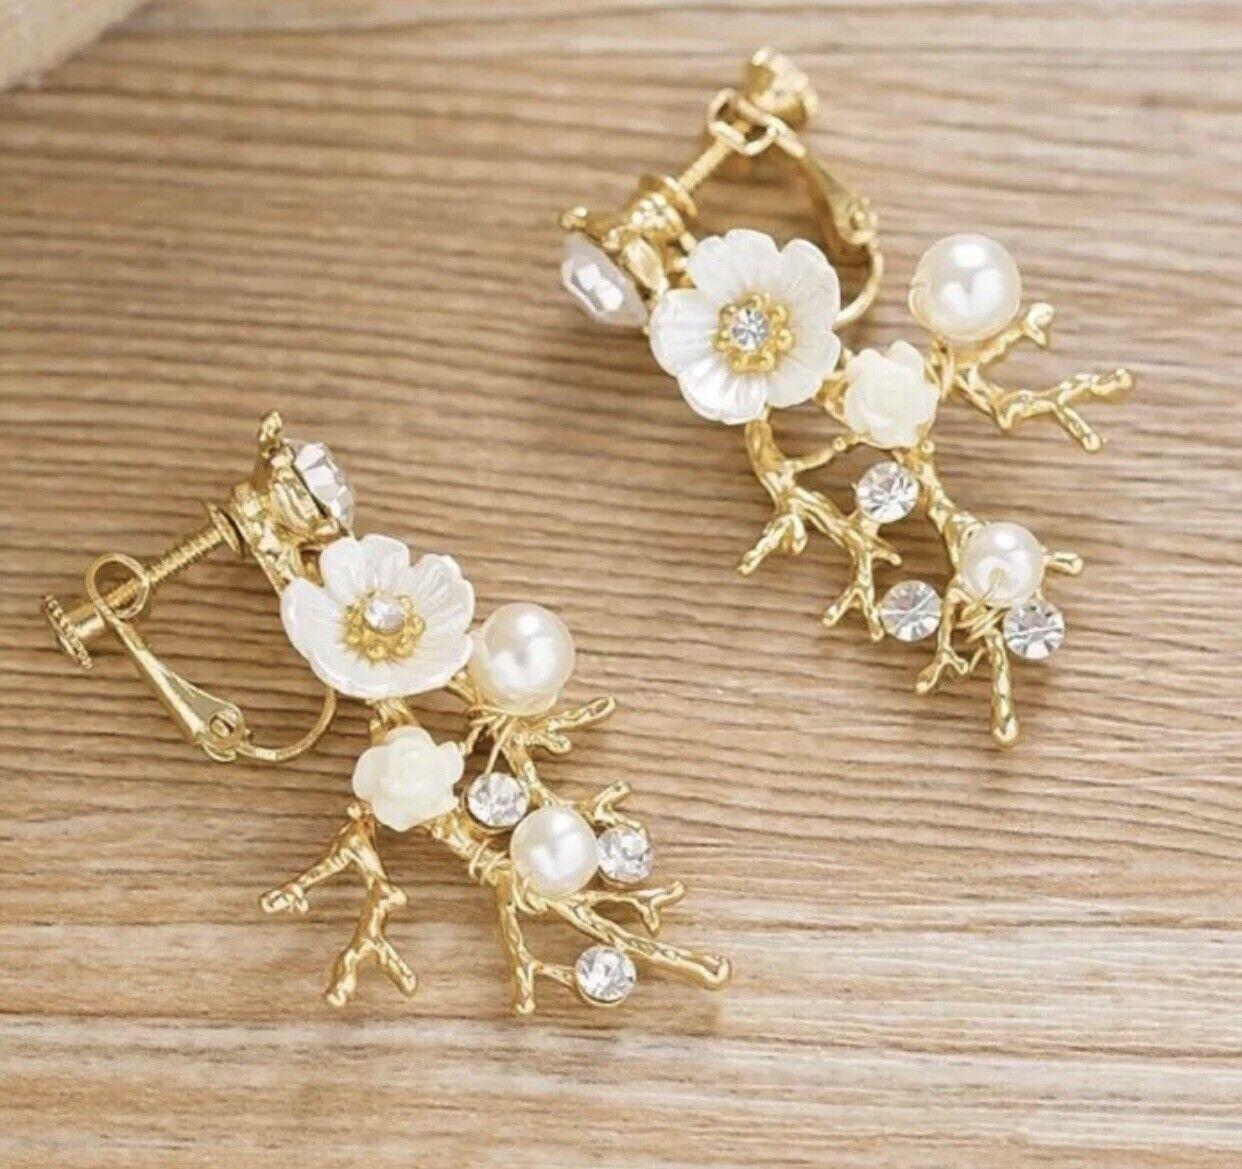 Bridesmaid Bridal Flower Gold Ivory Vintage Style Pearl Crystal Earring Set